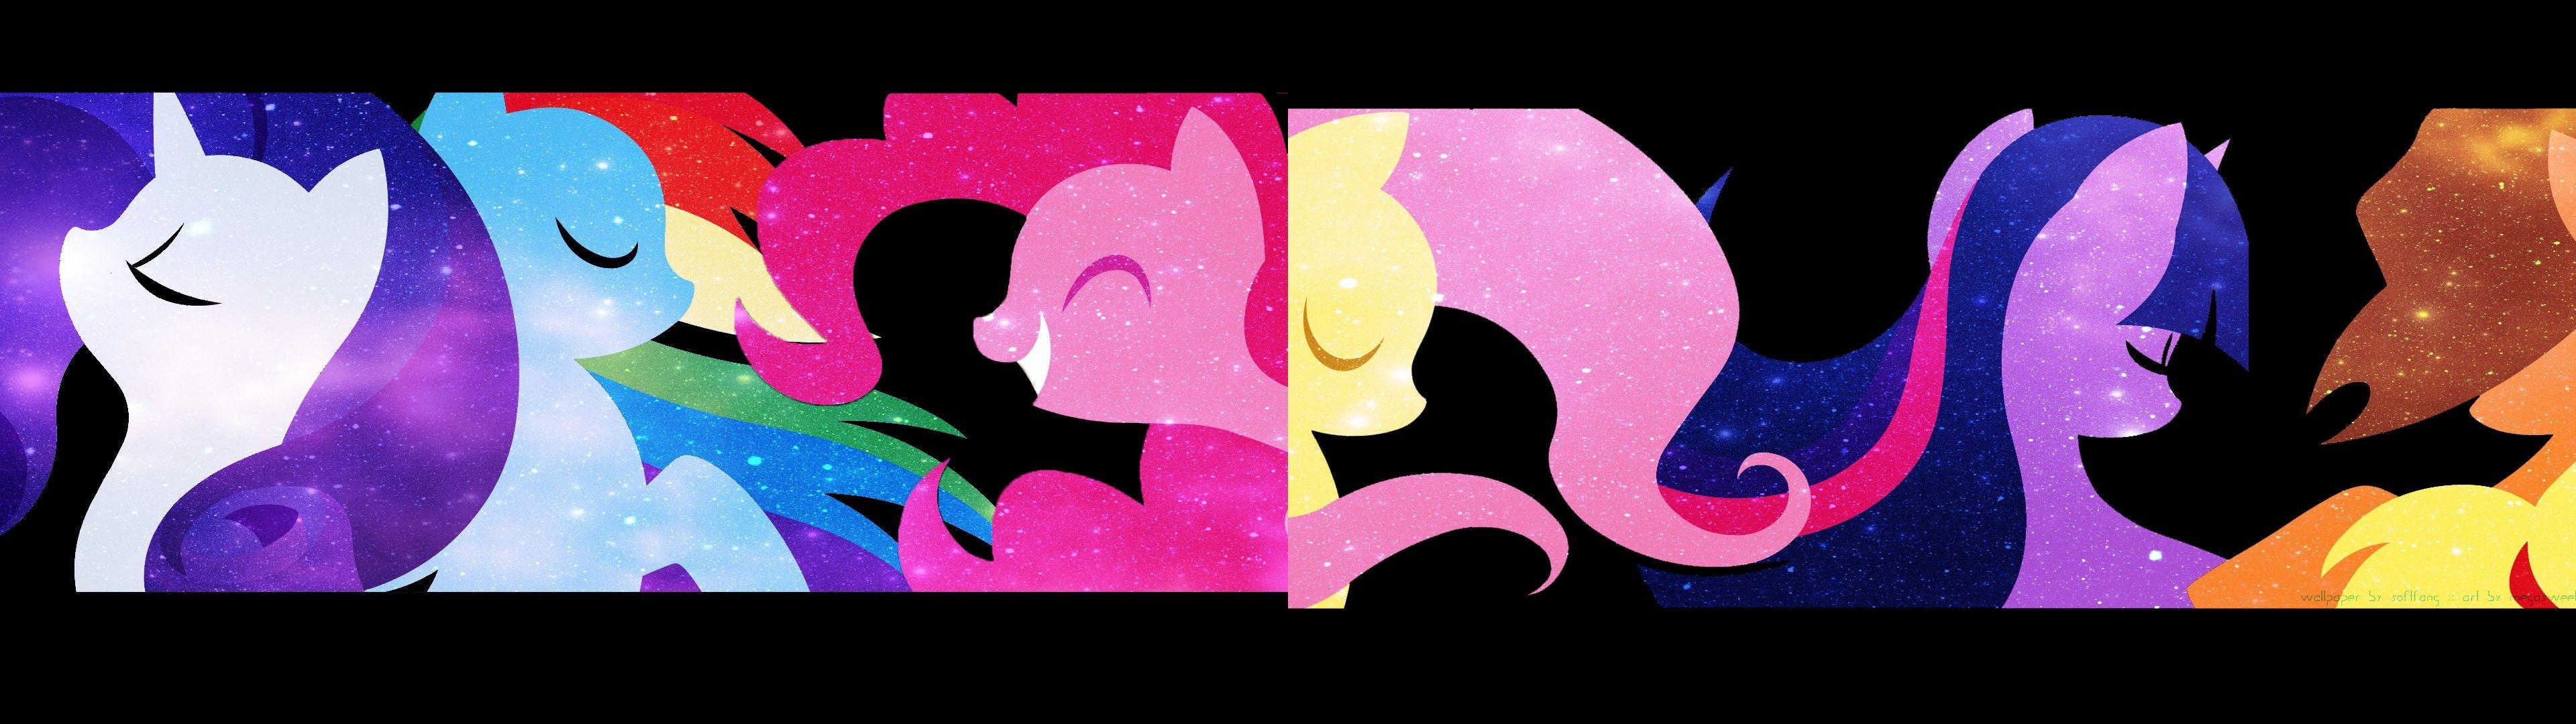 Applejack Rainbow Dash Fluttershy Rarity Pinkie Pie